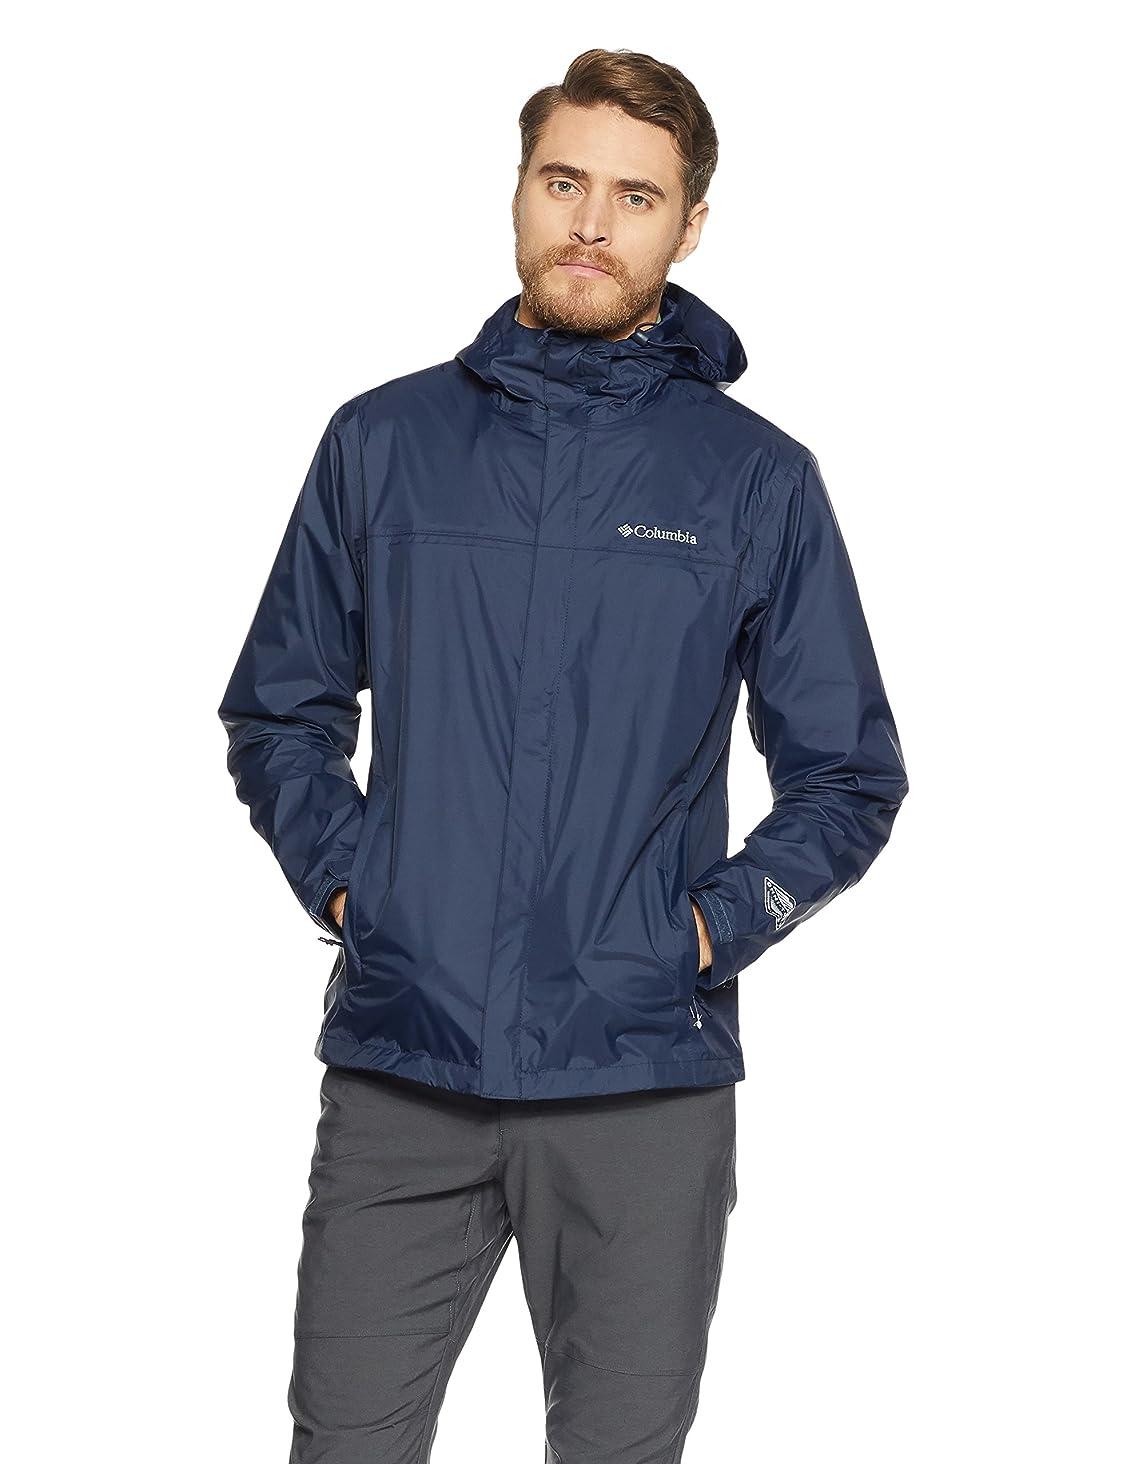 Columbia Men's Watertight II Jacket, Waterproof & Breathable